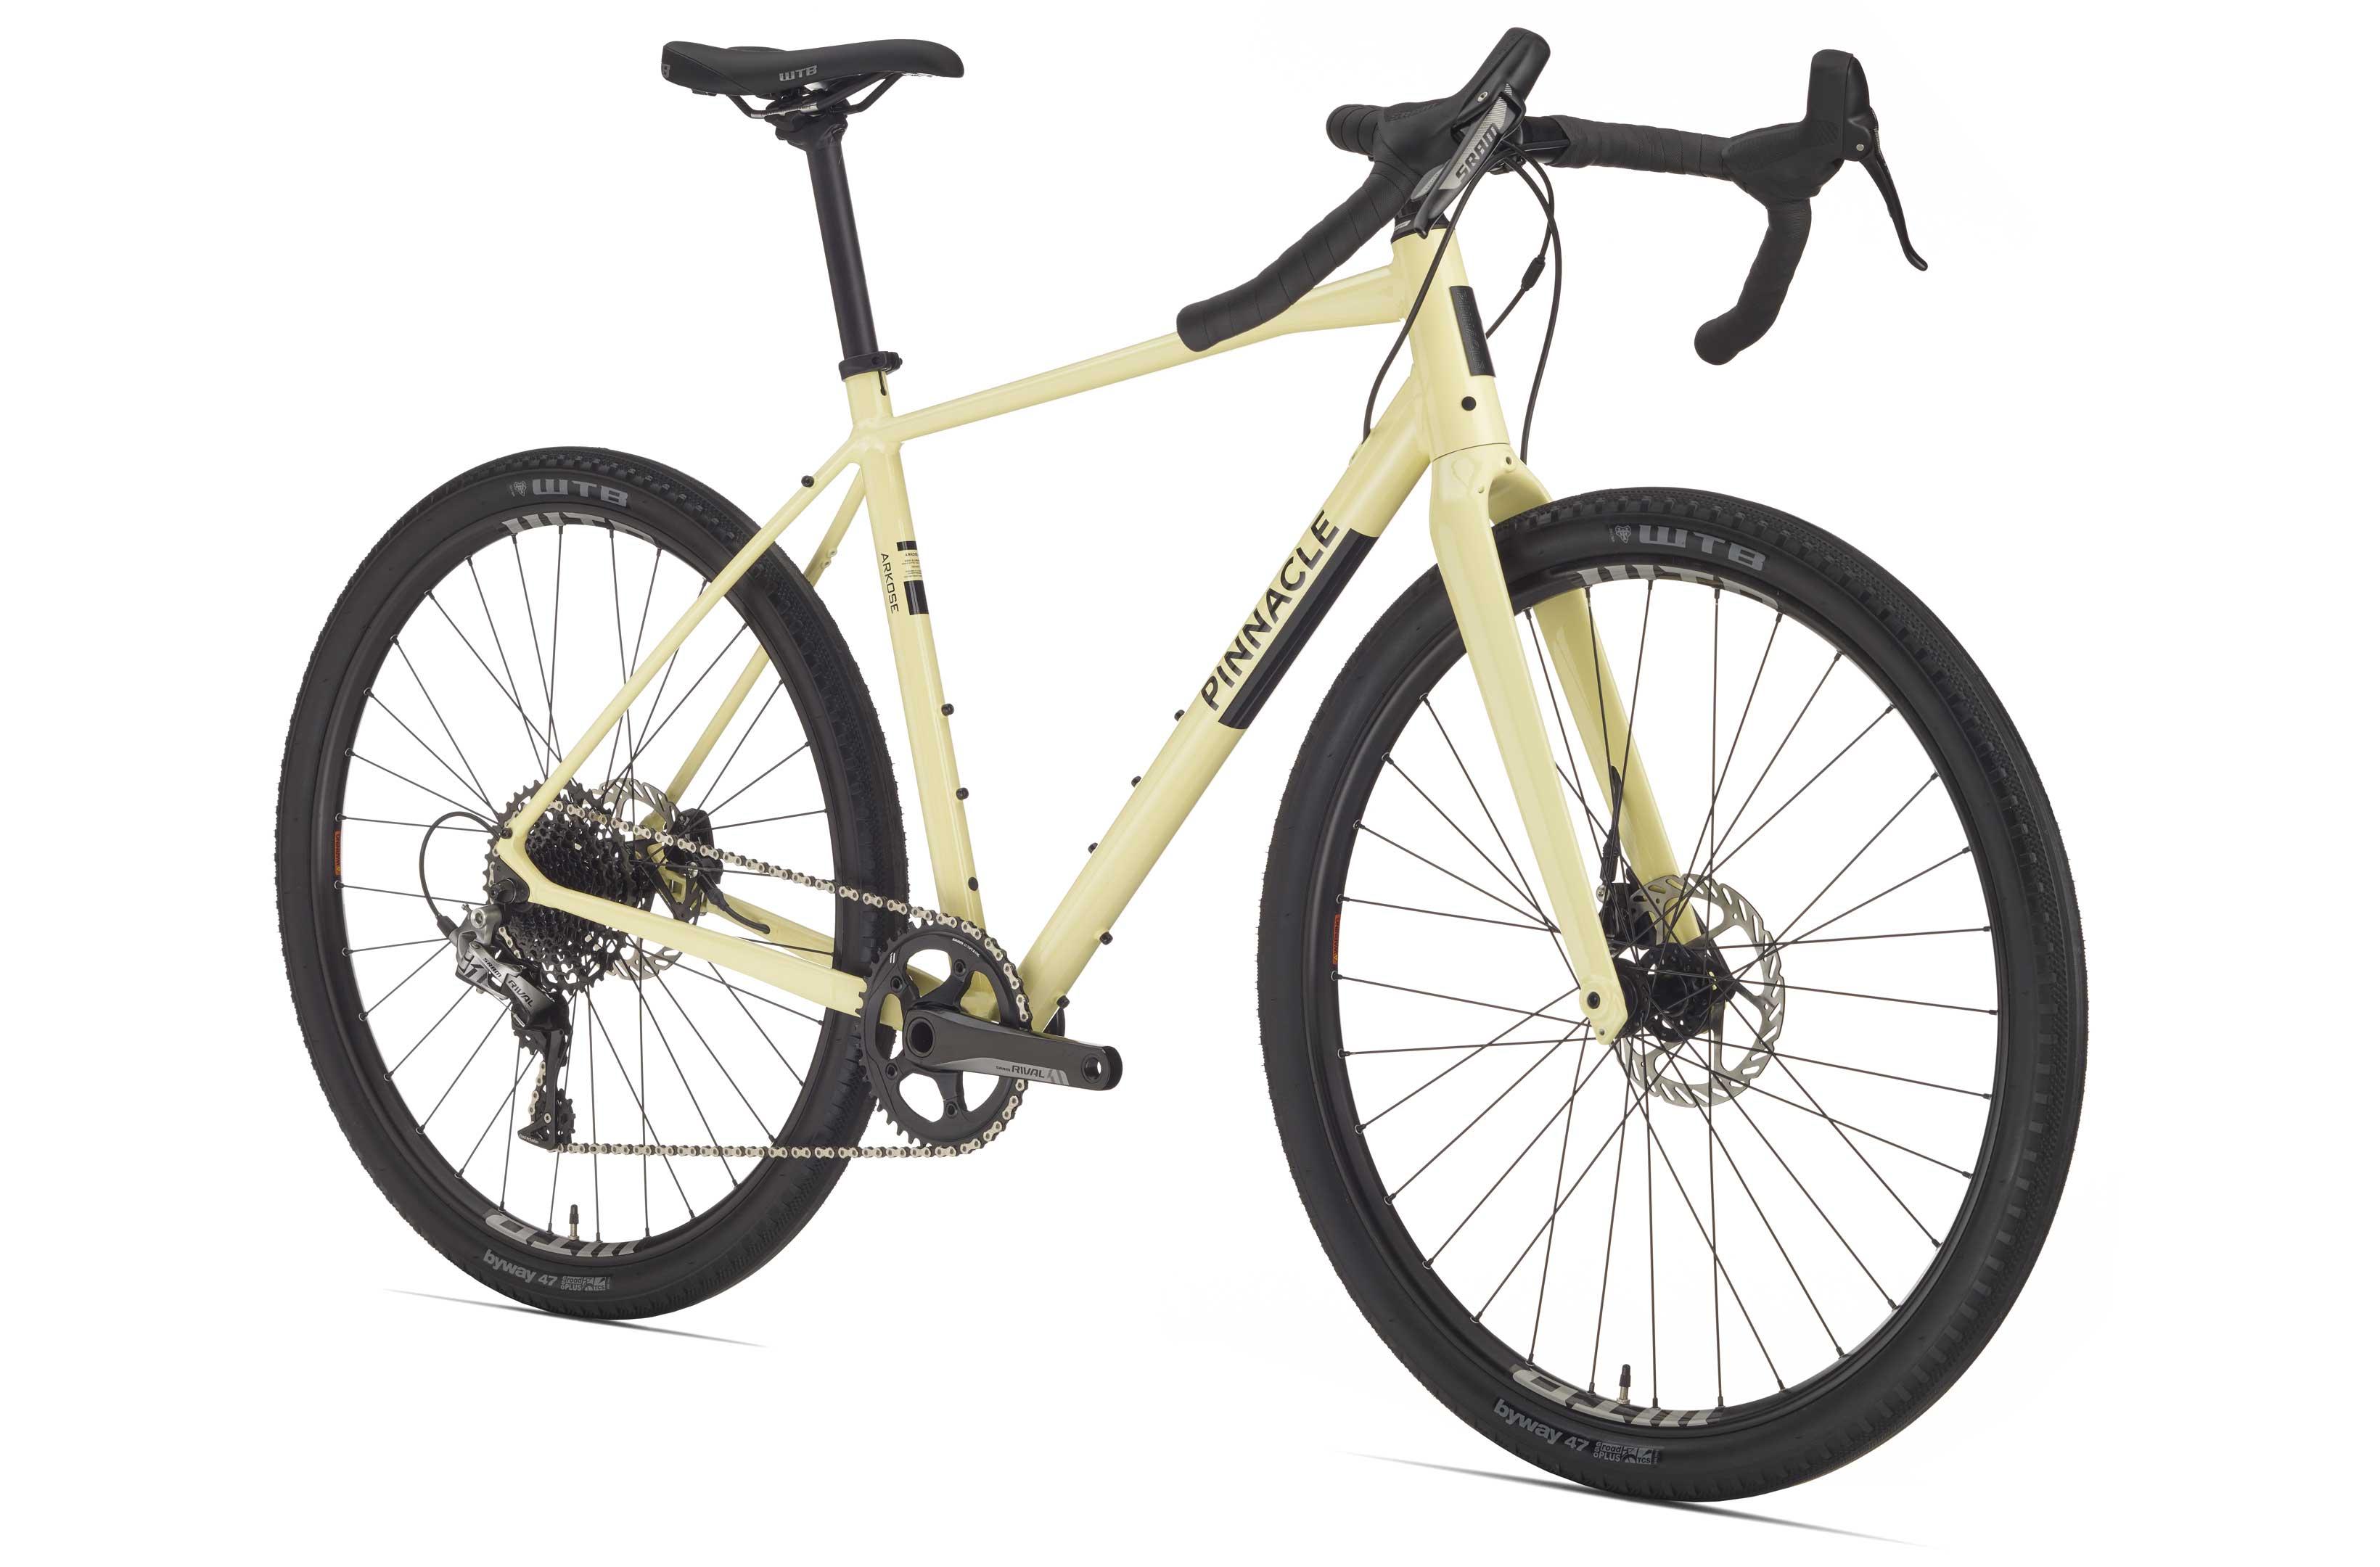 Pinnacle Arkose X 2019 Gravel Bike £945 at Evans Cycles